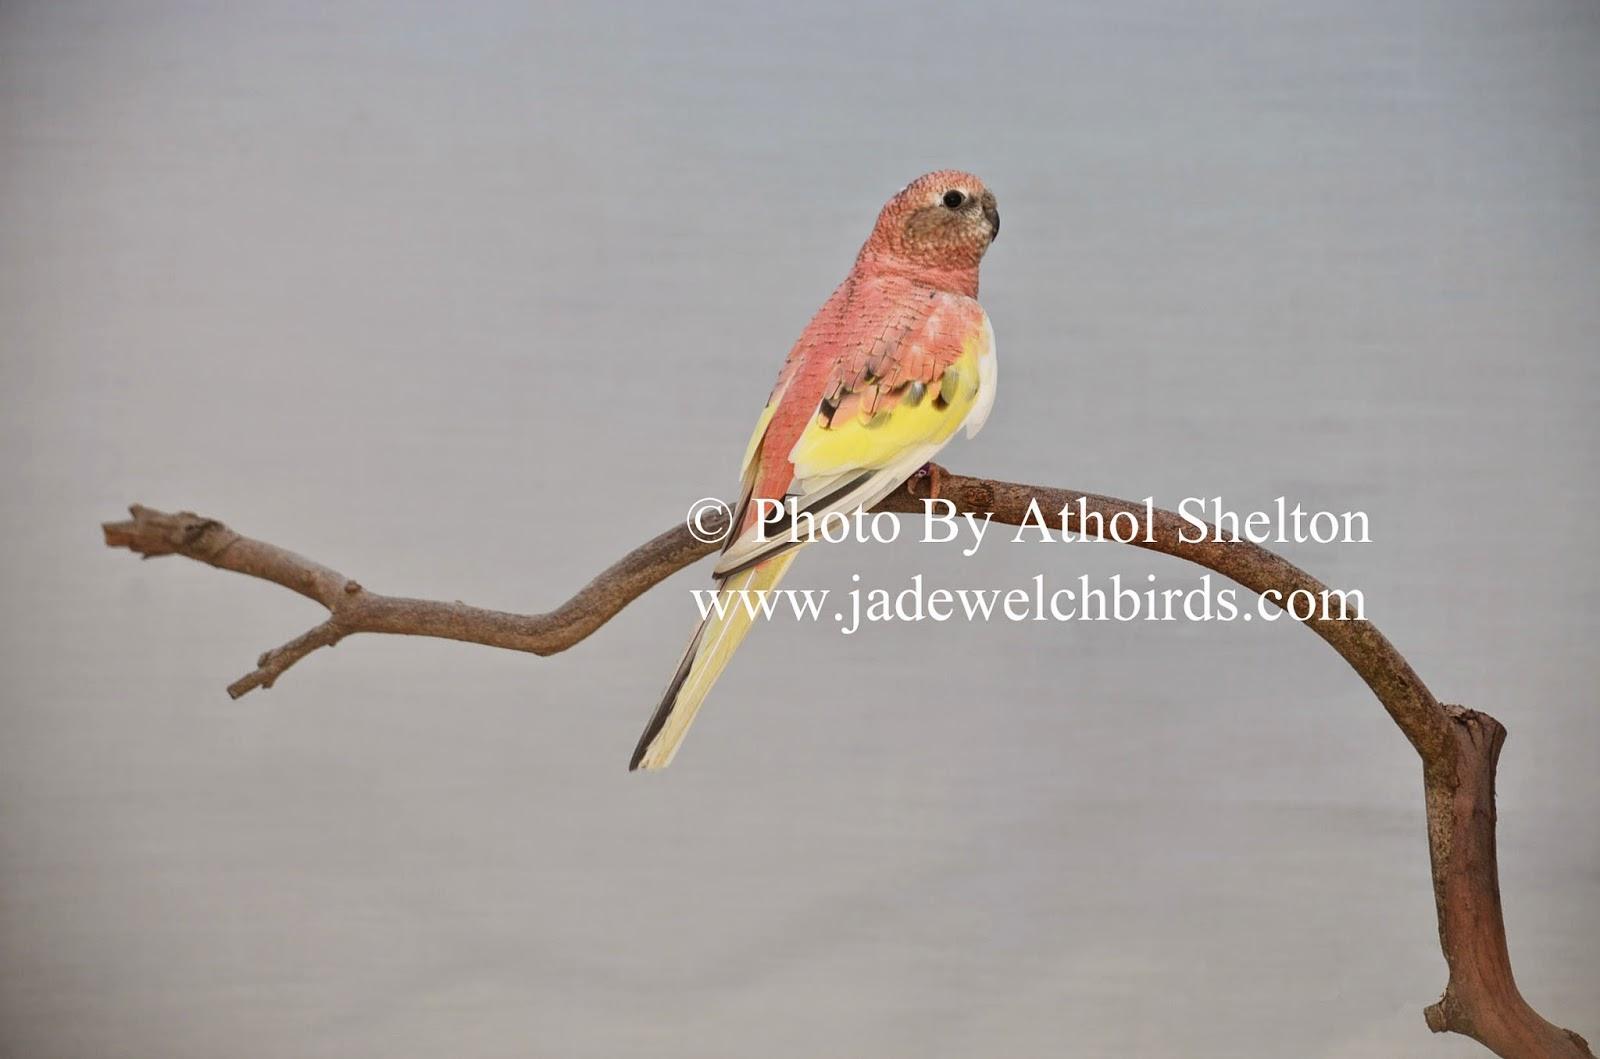 rosa pied bourke athol shelton jade welch jadewelchbirds.com